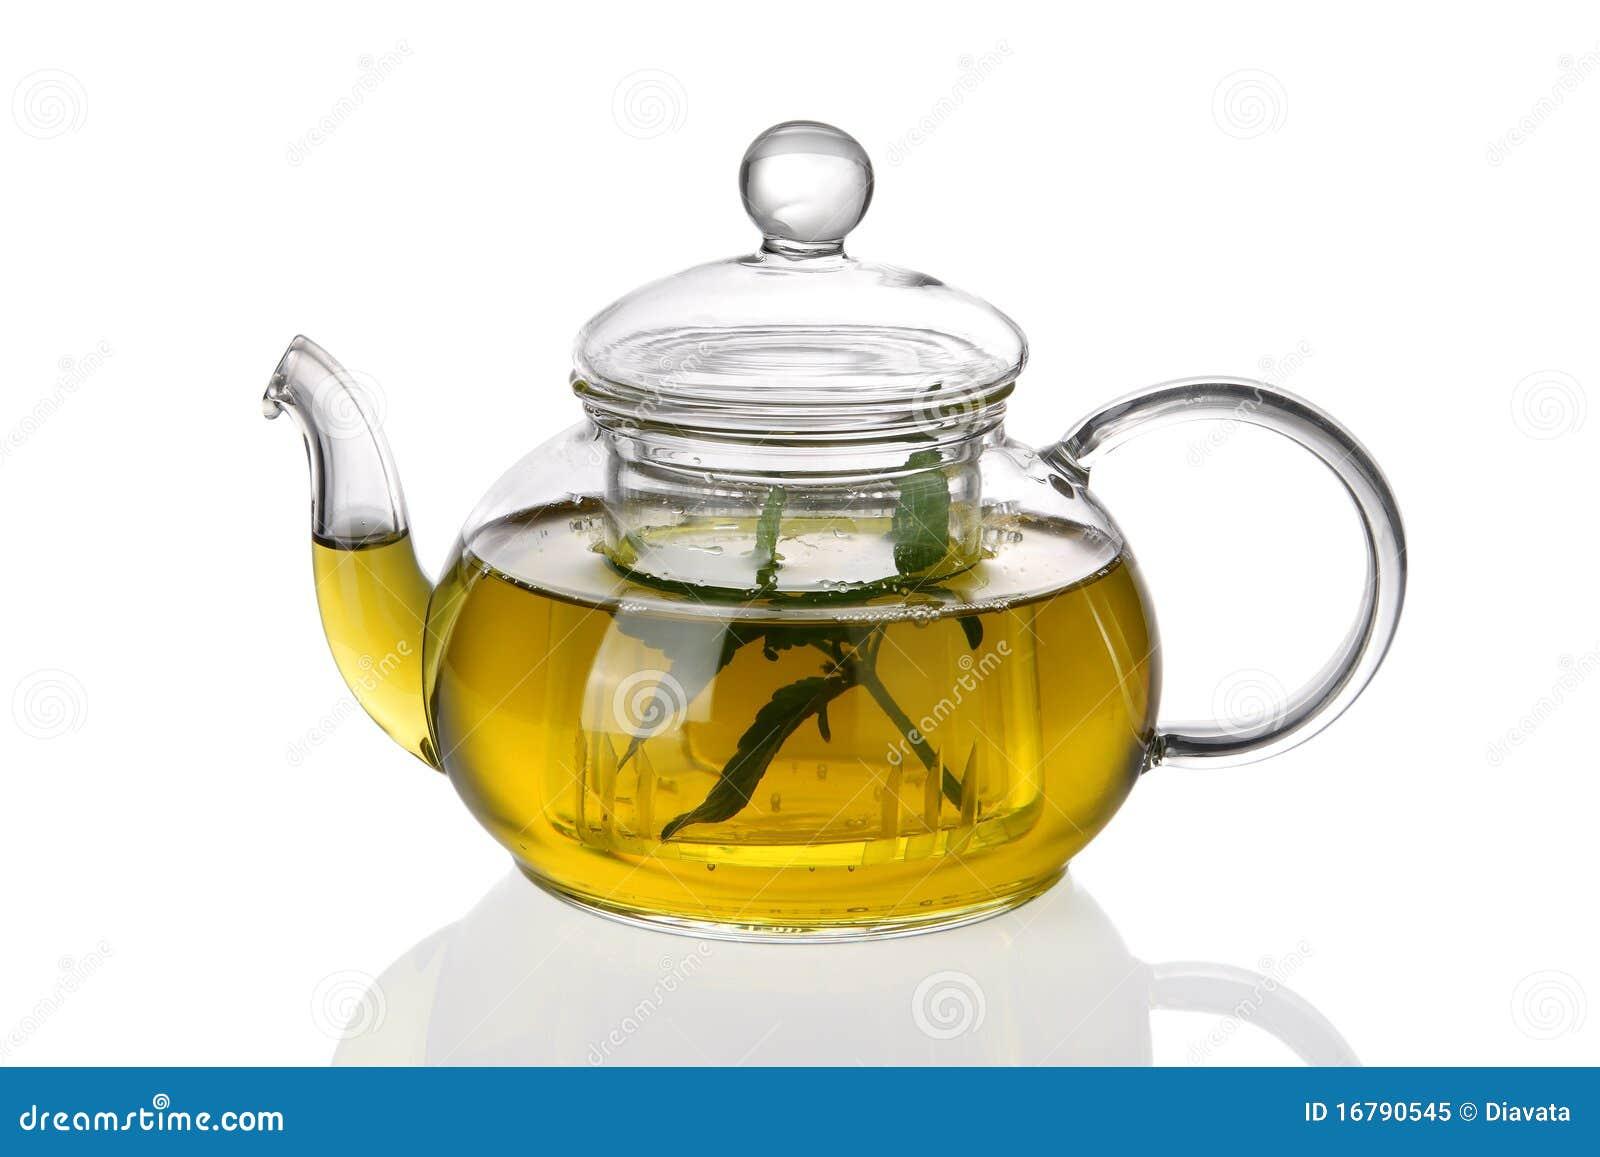 Teiera con tè ed i fogli freschi